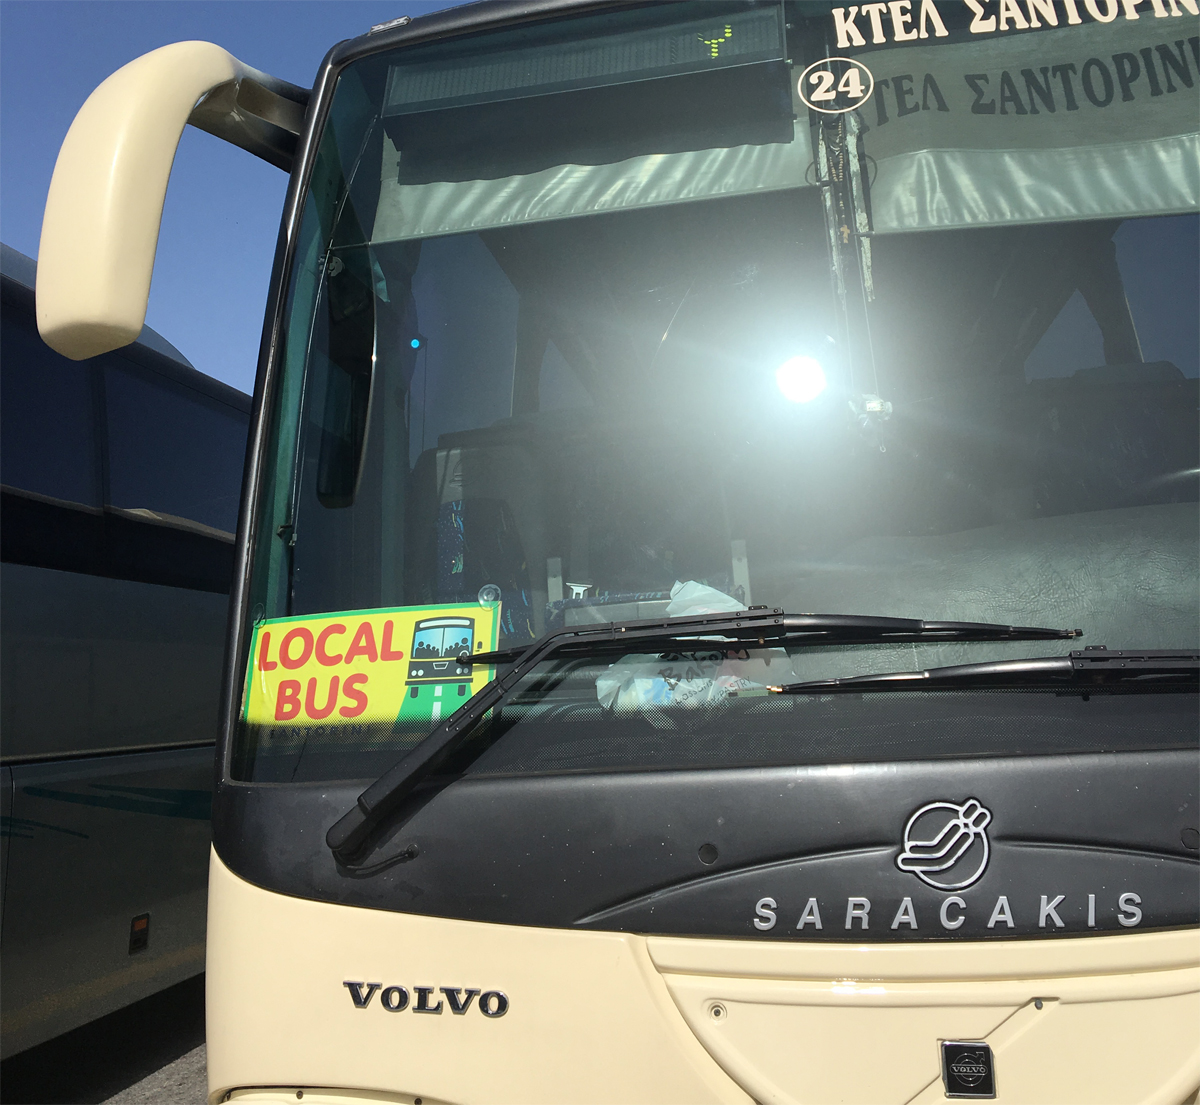 santorini-bus-2